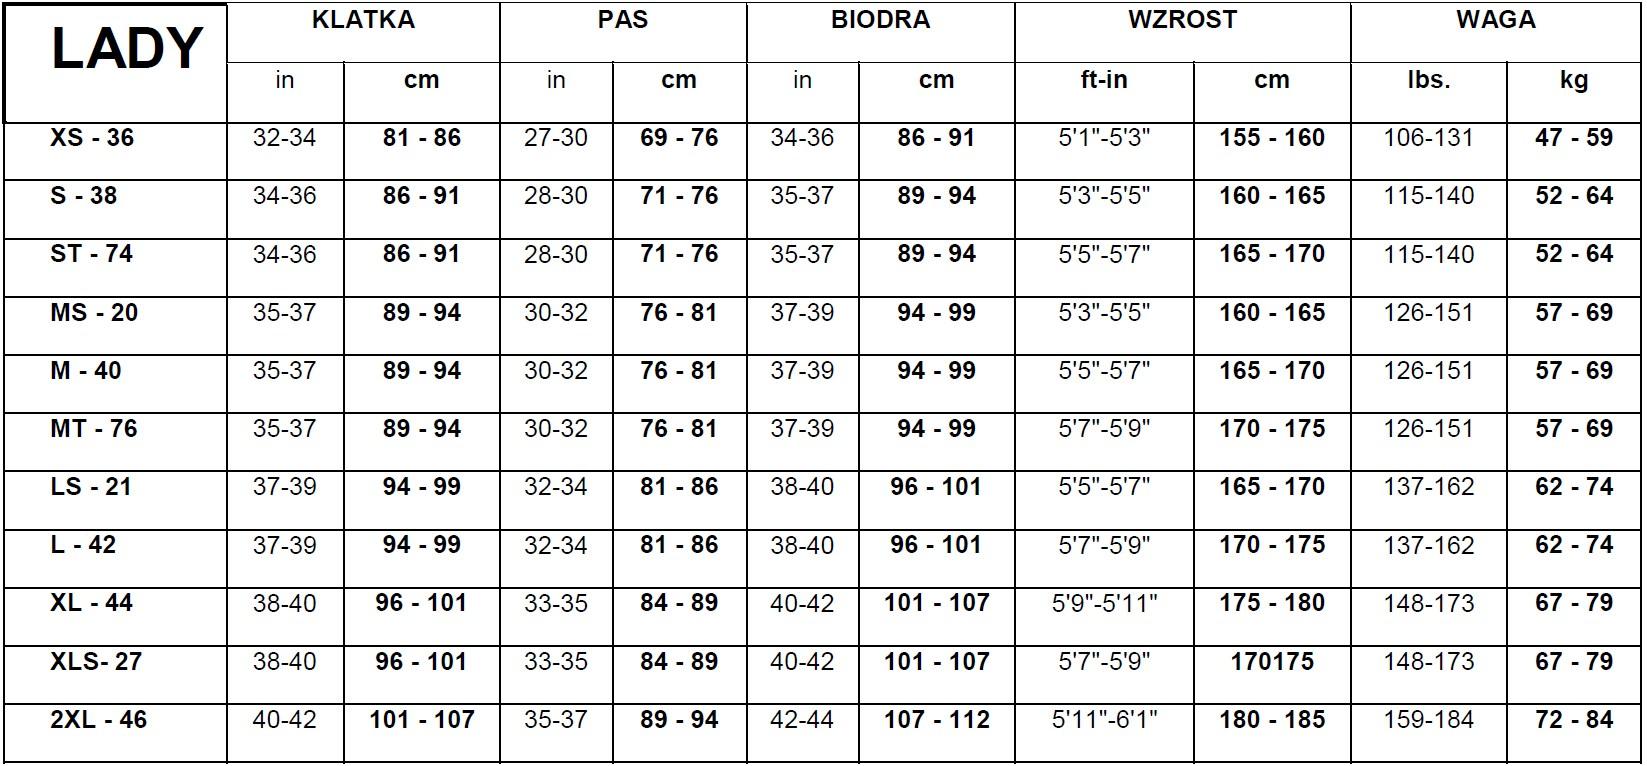 SCUBAPRO Everflex 5/4mm Damski - tabela